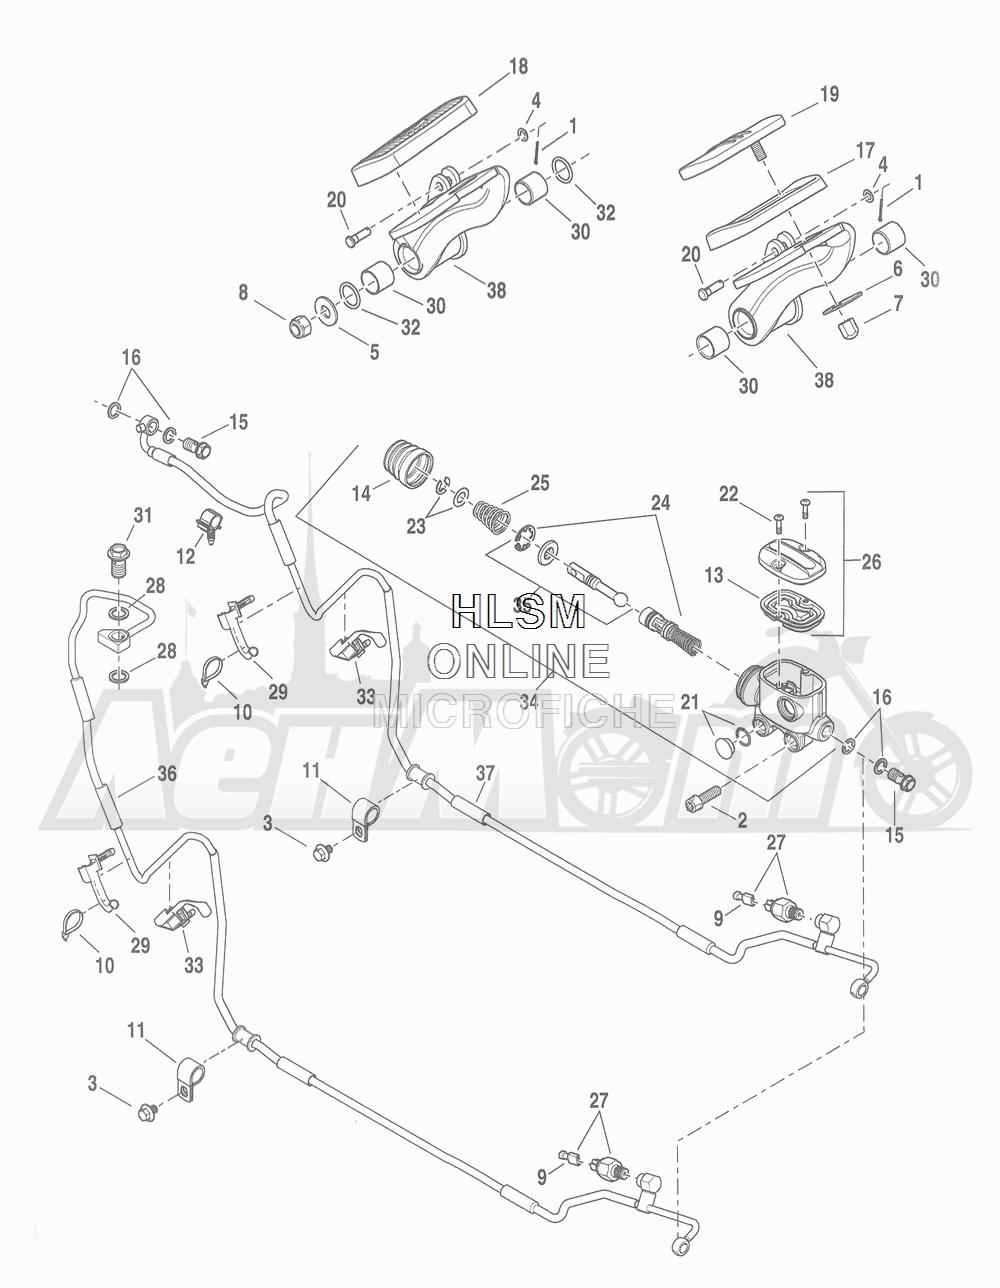 Запчасти для Мотоцикла Harley-Davidson 2016 FLHR ROAD KING (FBM) Раздел: BRAKE - REAR BRAKE CYLINDER W/ PEDAL | задний тормоз тормоза цилиндр вместе с педаль